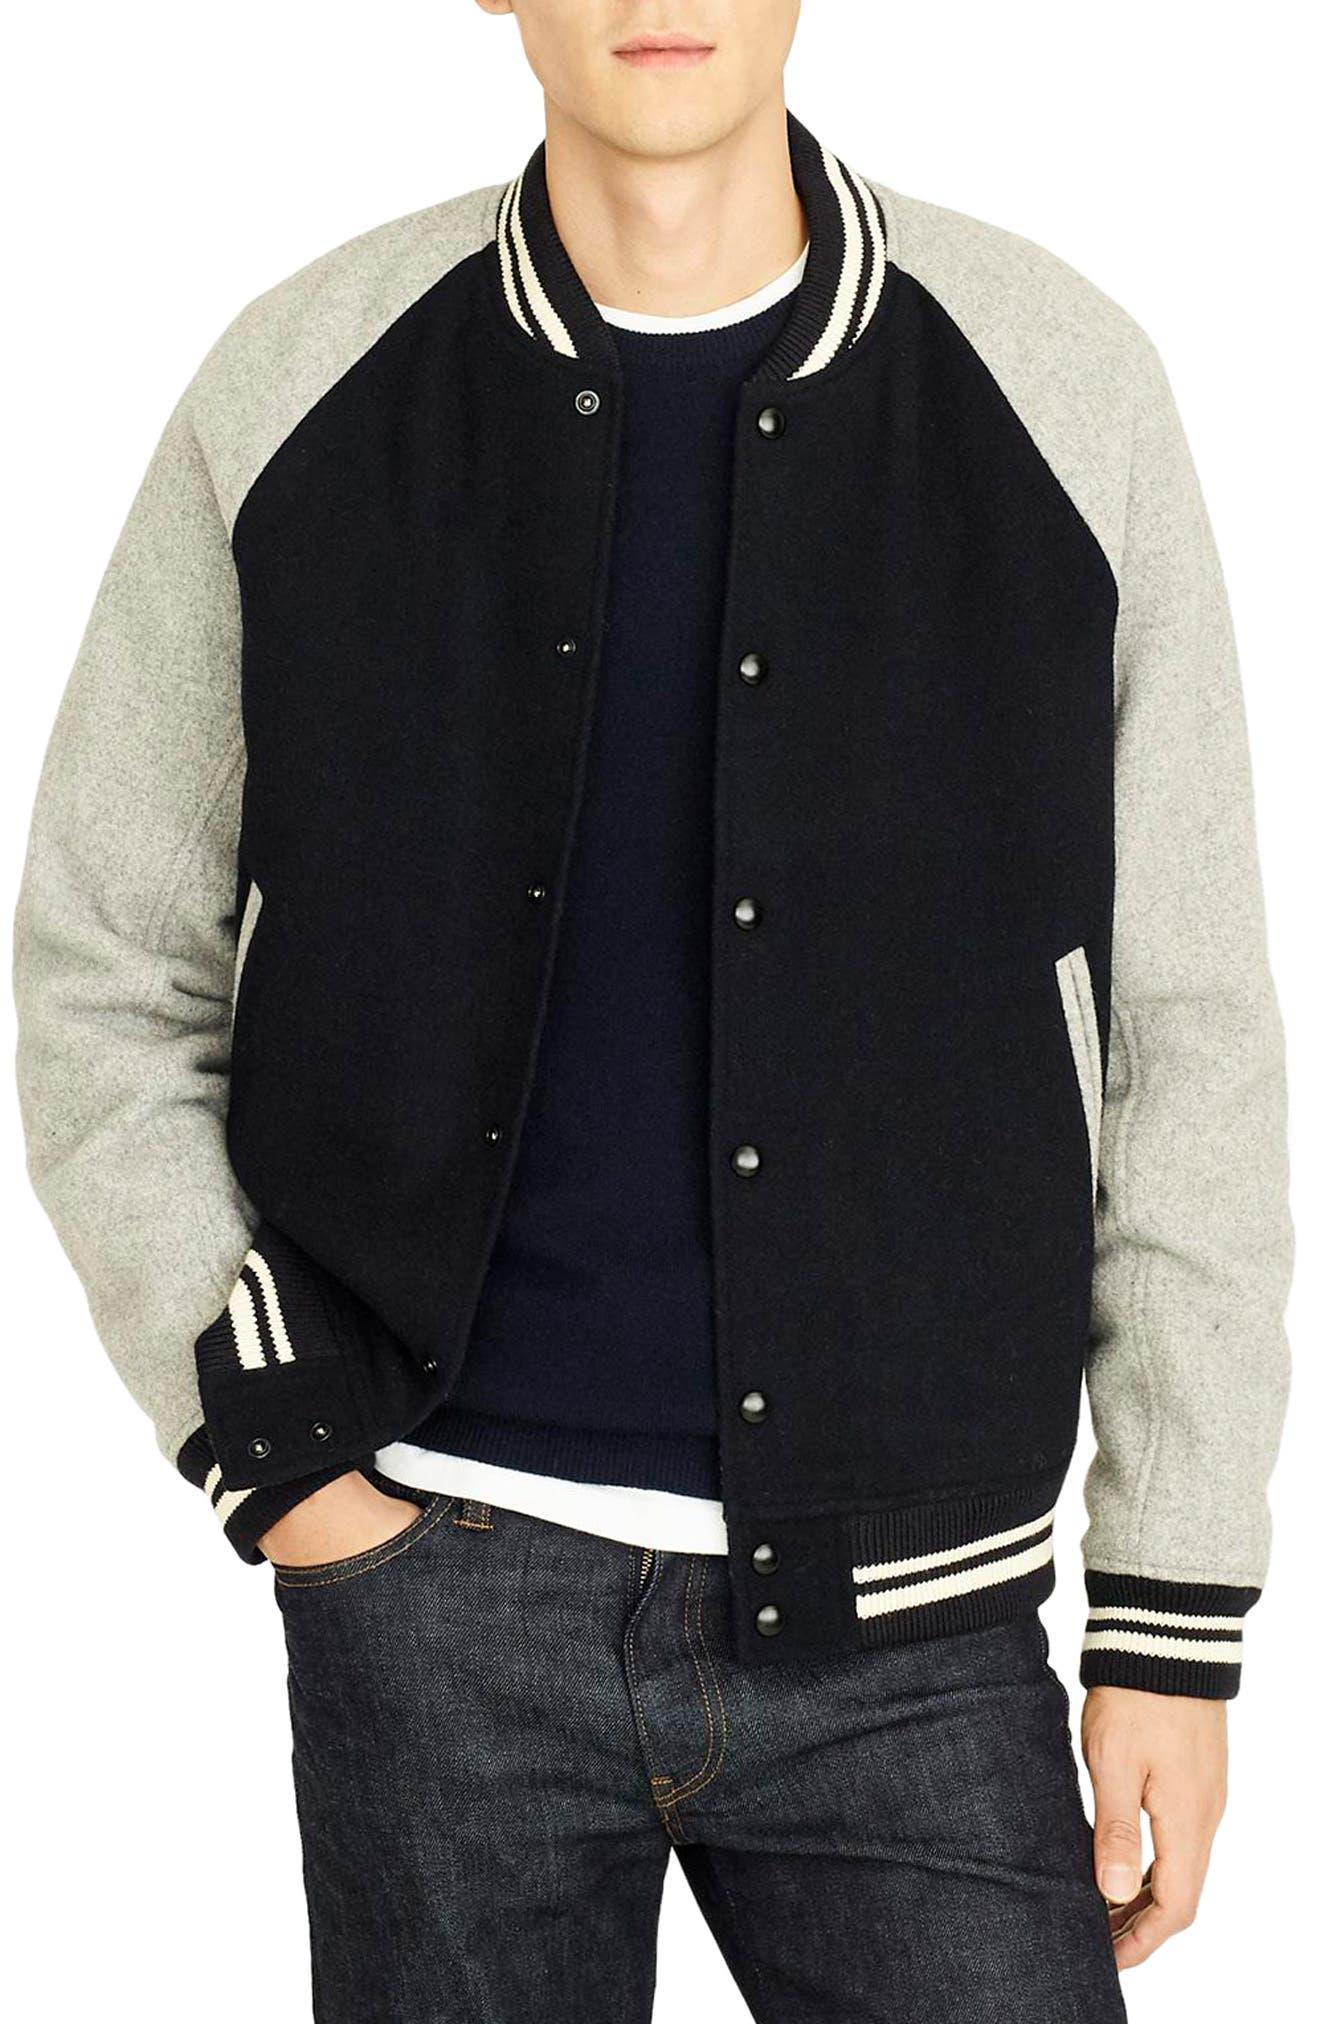 Letterman Wool Blend Jacket,                         Main,                         color, DEEPEST NAVY